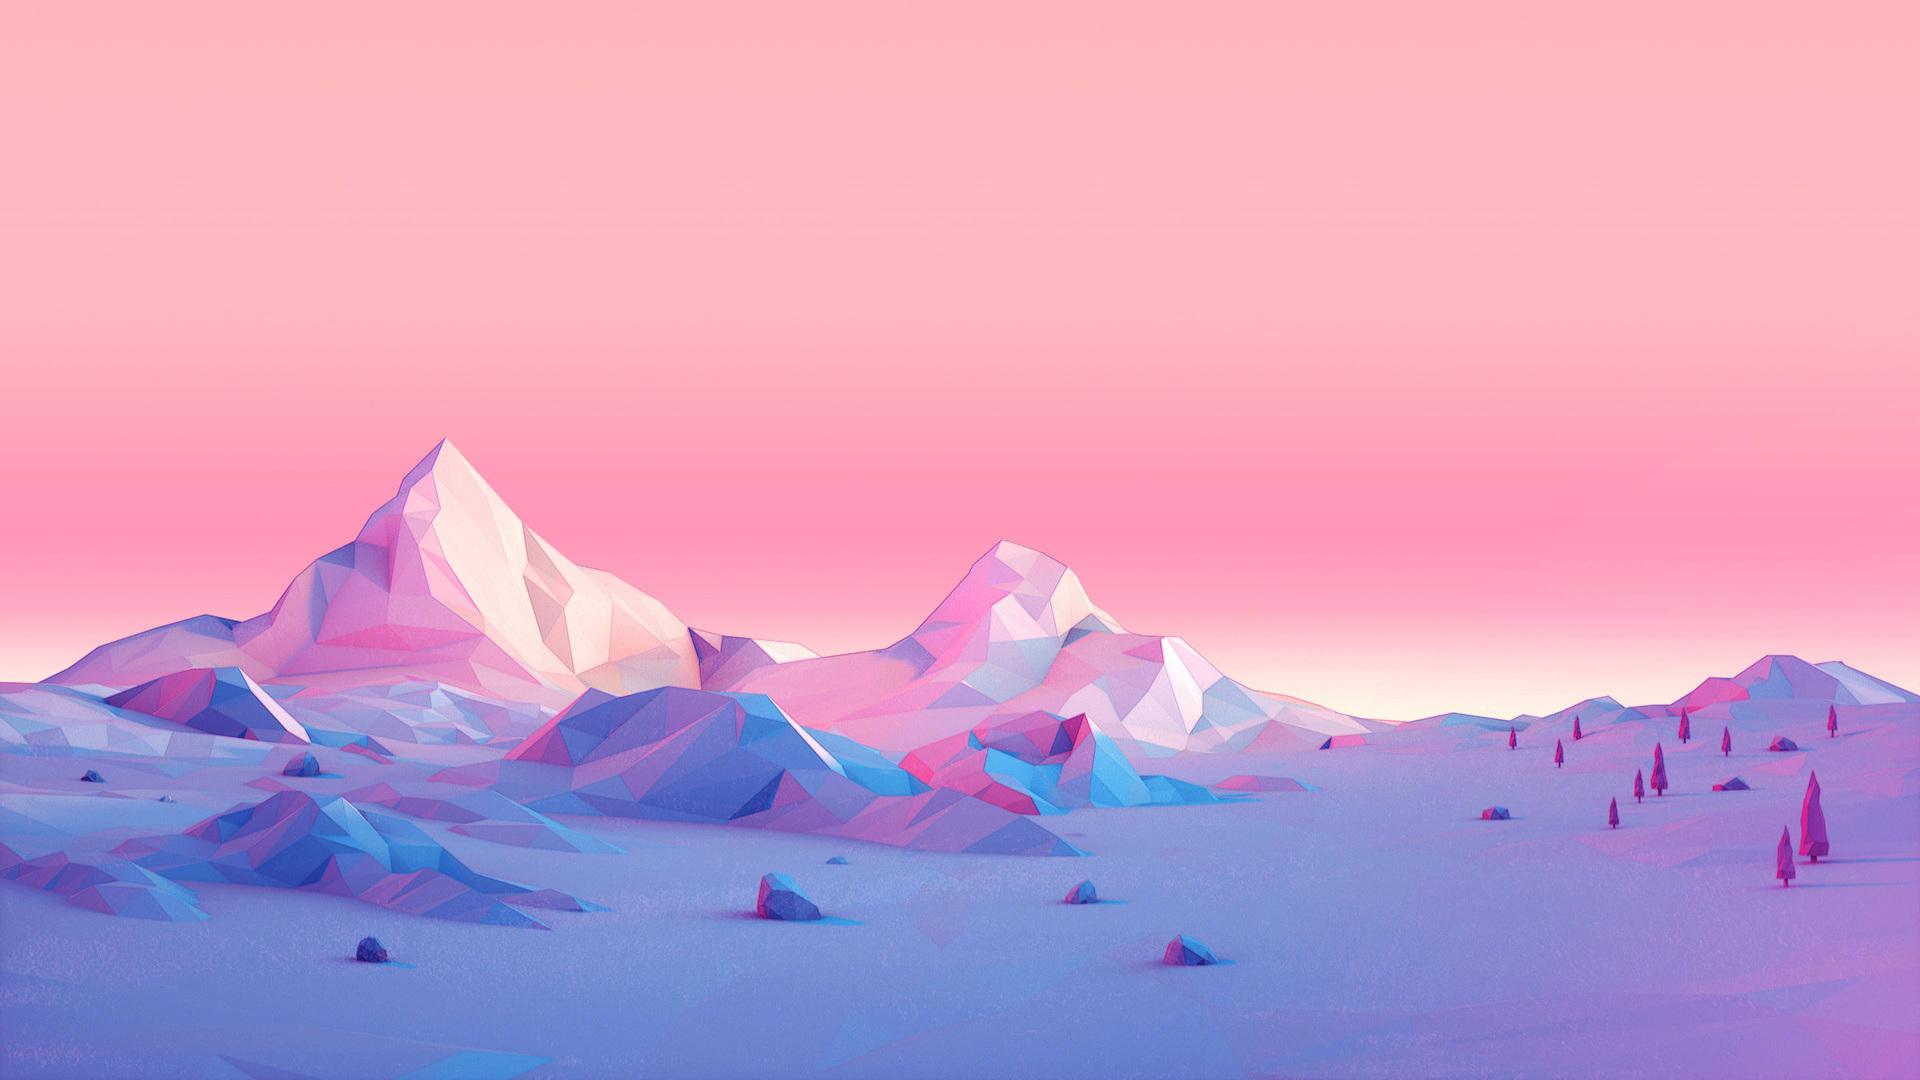 Minimalism Mountain Peak Full Hd Wallpaper: 1920x1080 Polygon Mountains Minimalist Laptop Full HD